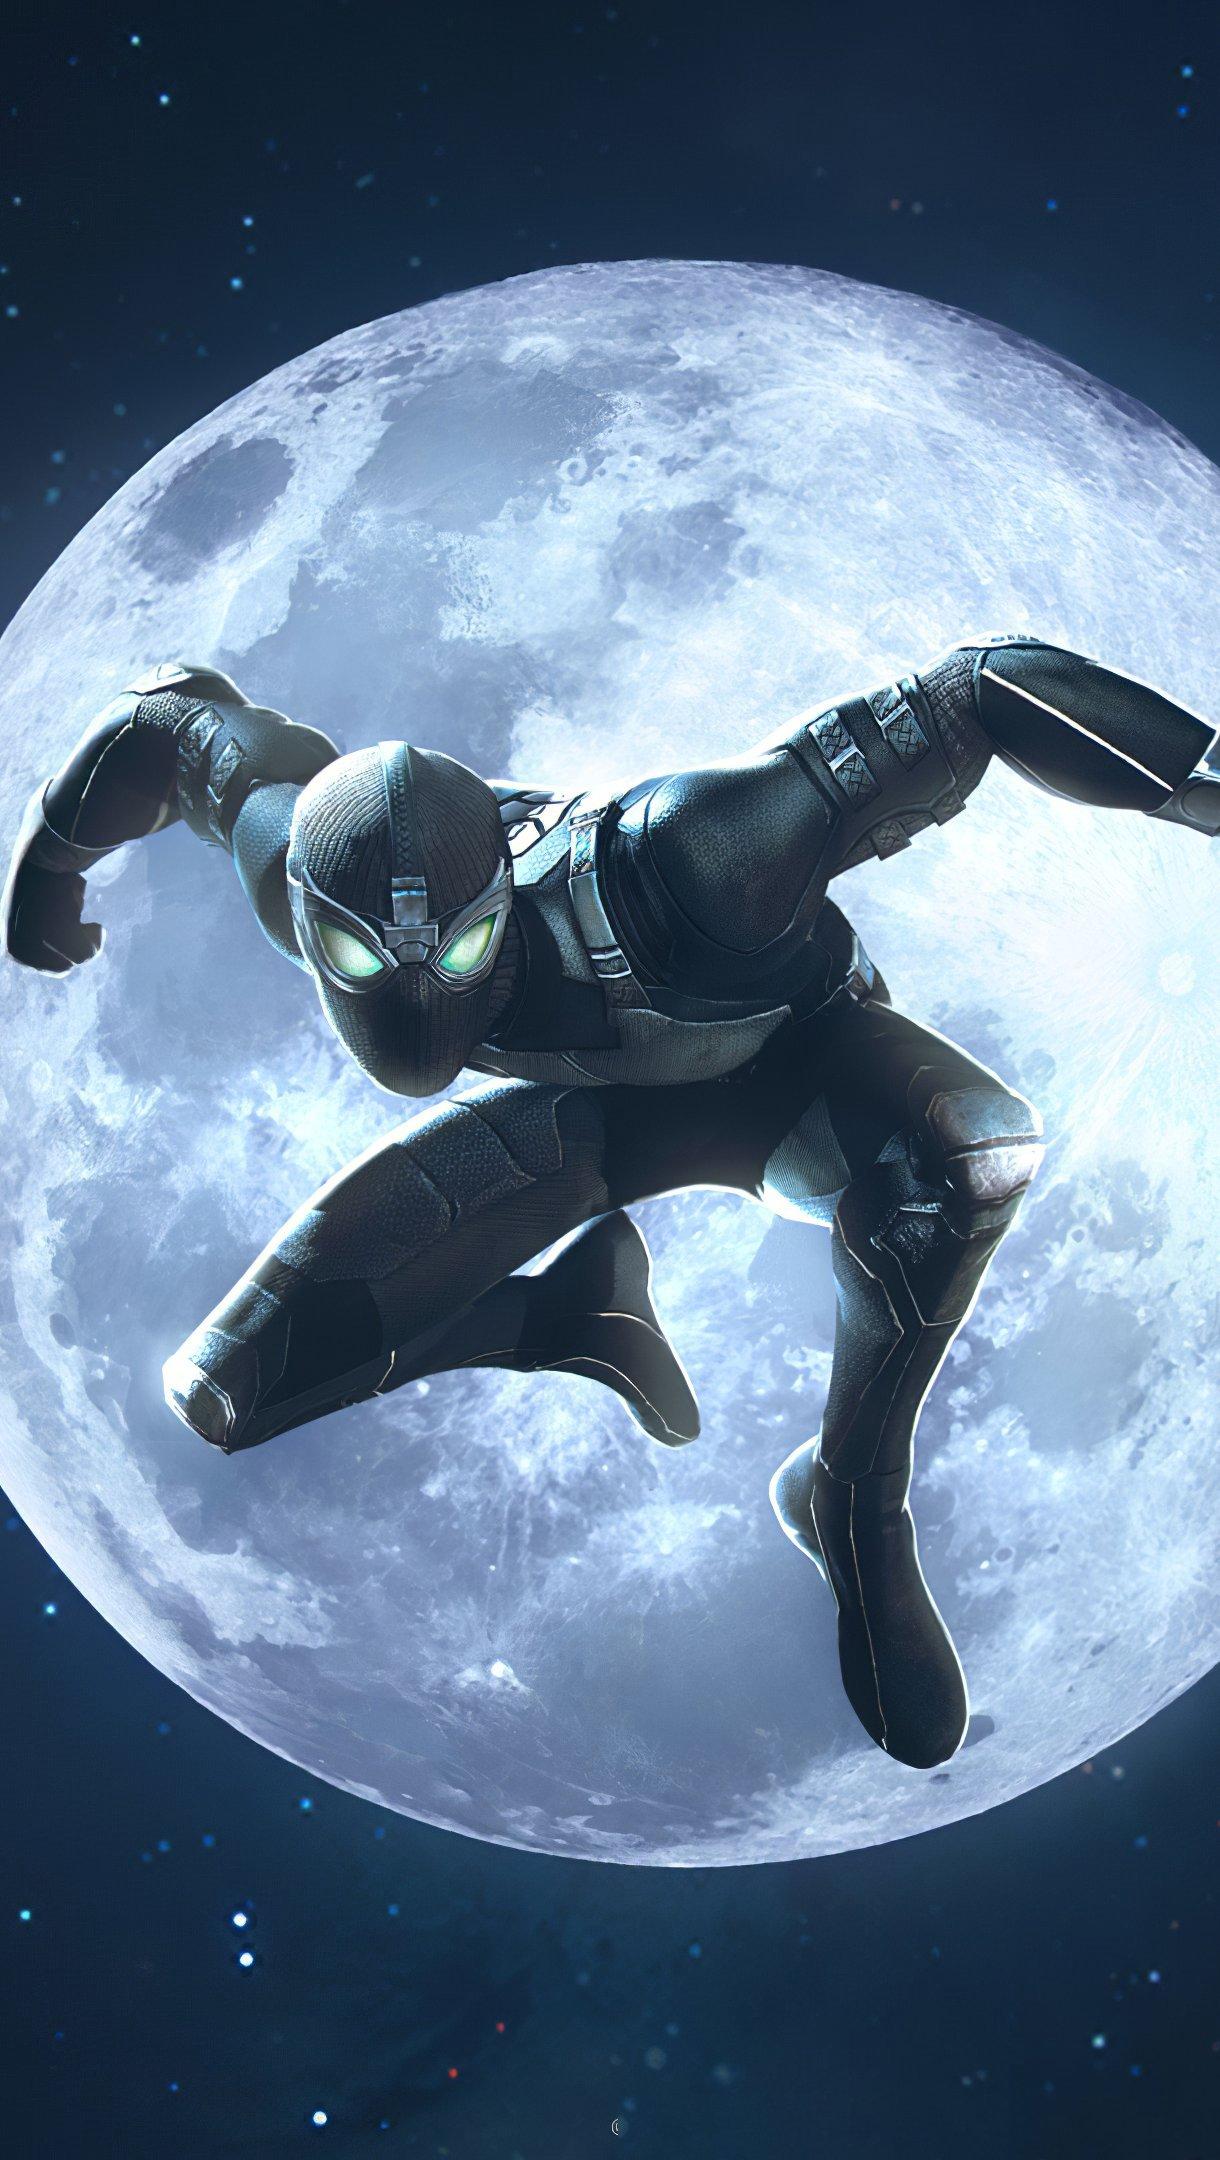 Fondos de pantalla El hombre araña traje negro en la luna Vertical